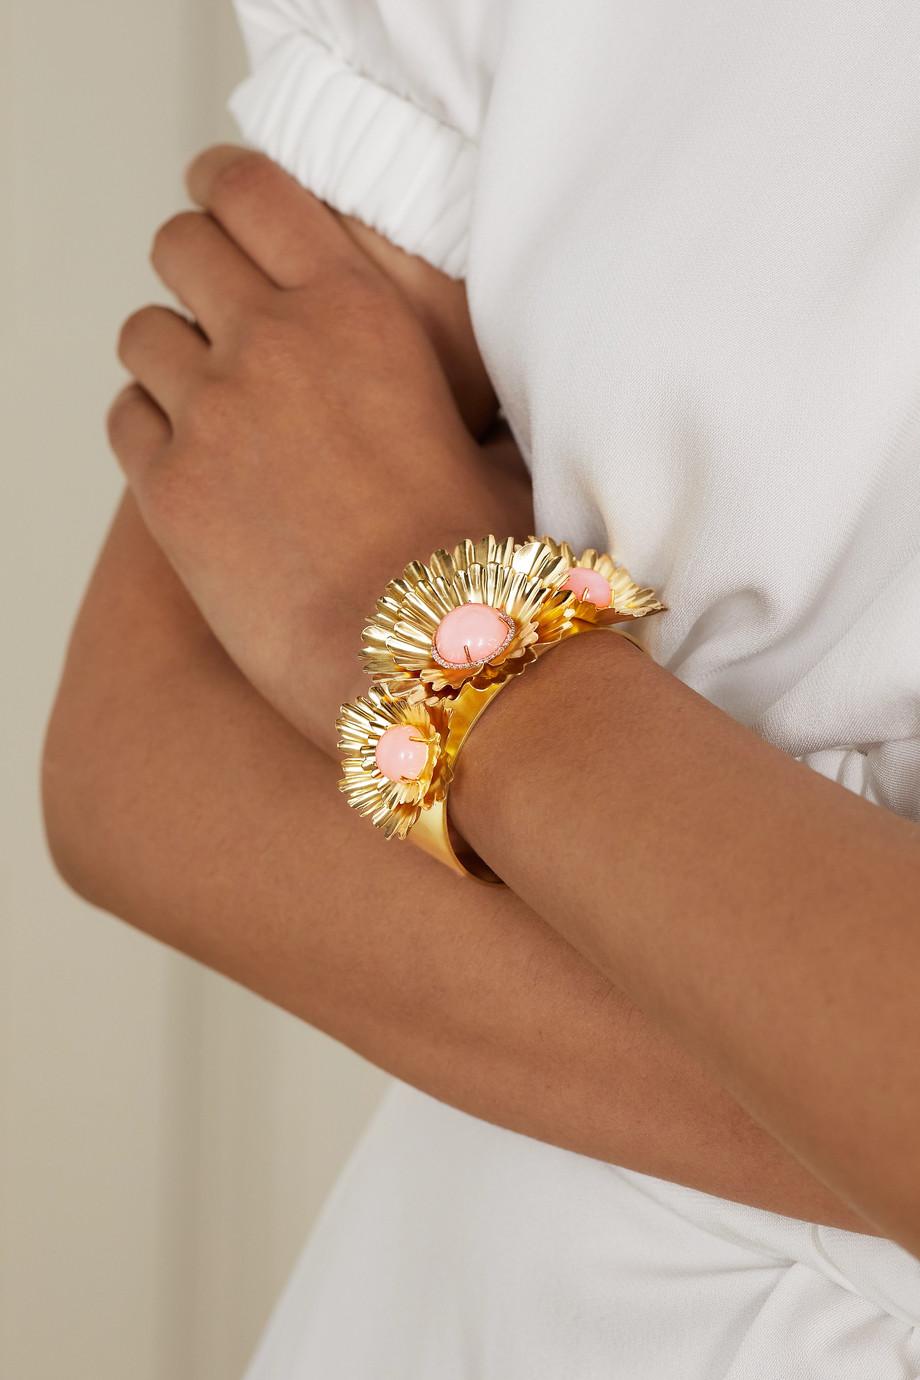 Irene Neuwirth Super Bloom 18-karat yellow and white gold, opal and diamond cuff